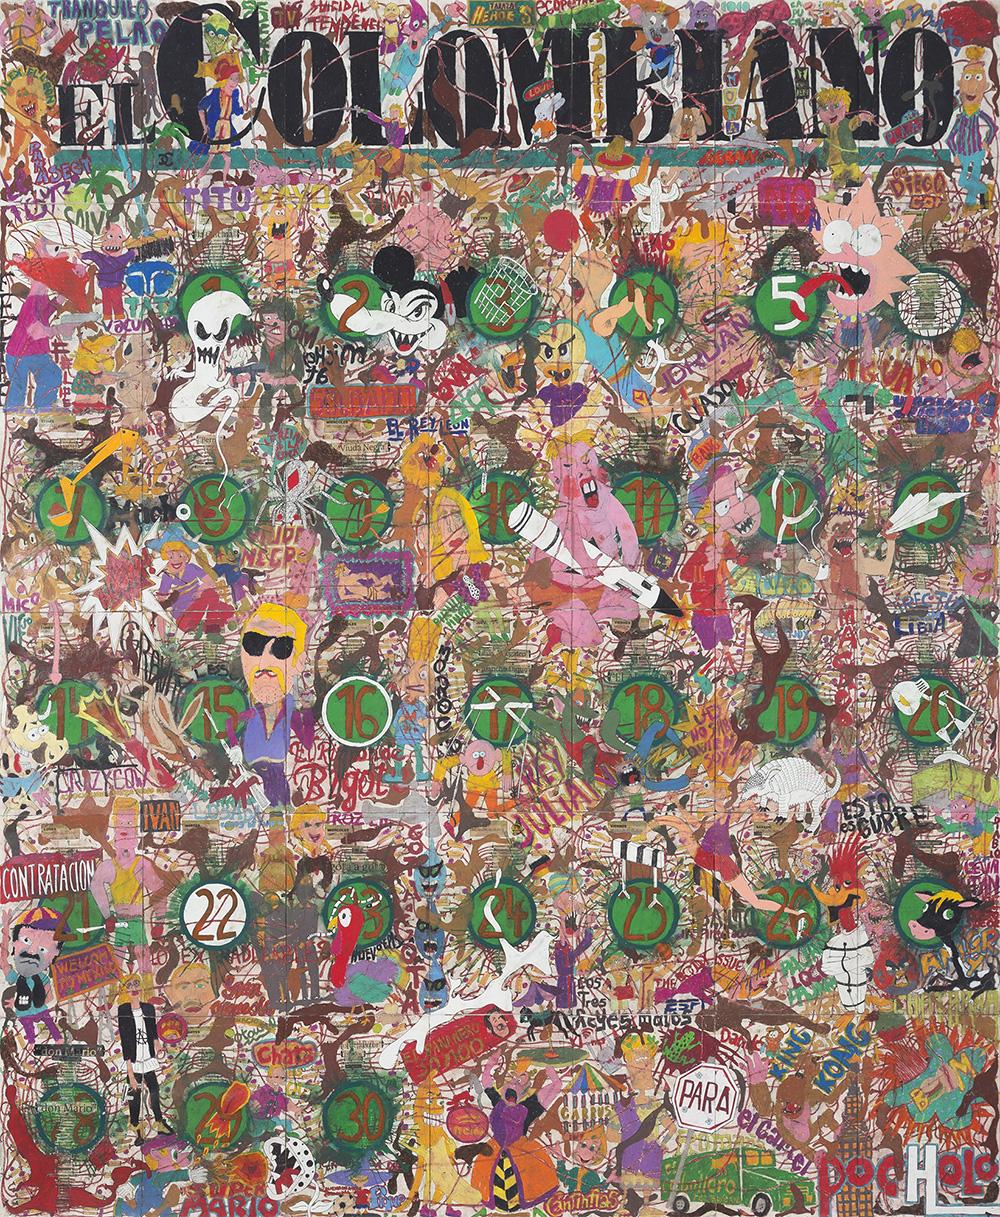 Art Bo, Feria Art Bo, Bogota art, Art Bogota, Art fair, El espectador, calendar, narco, narco art, Camilo Restrepo, Steve Turner, Los Angeles, Medellín, Colombia, Colombian artist, Tight Rope, pastel on paper, contemporary colombian artist, contemporary art Colombia, contemporary art gallery los angeles